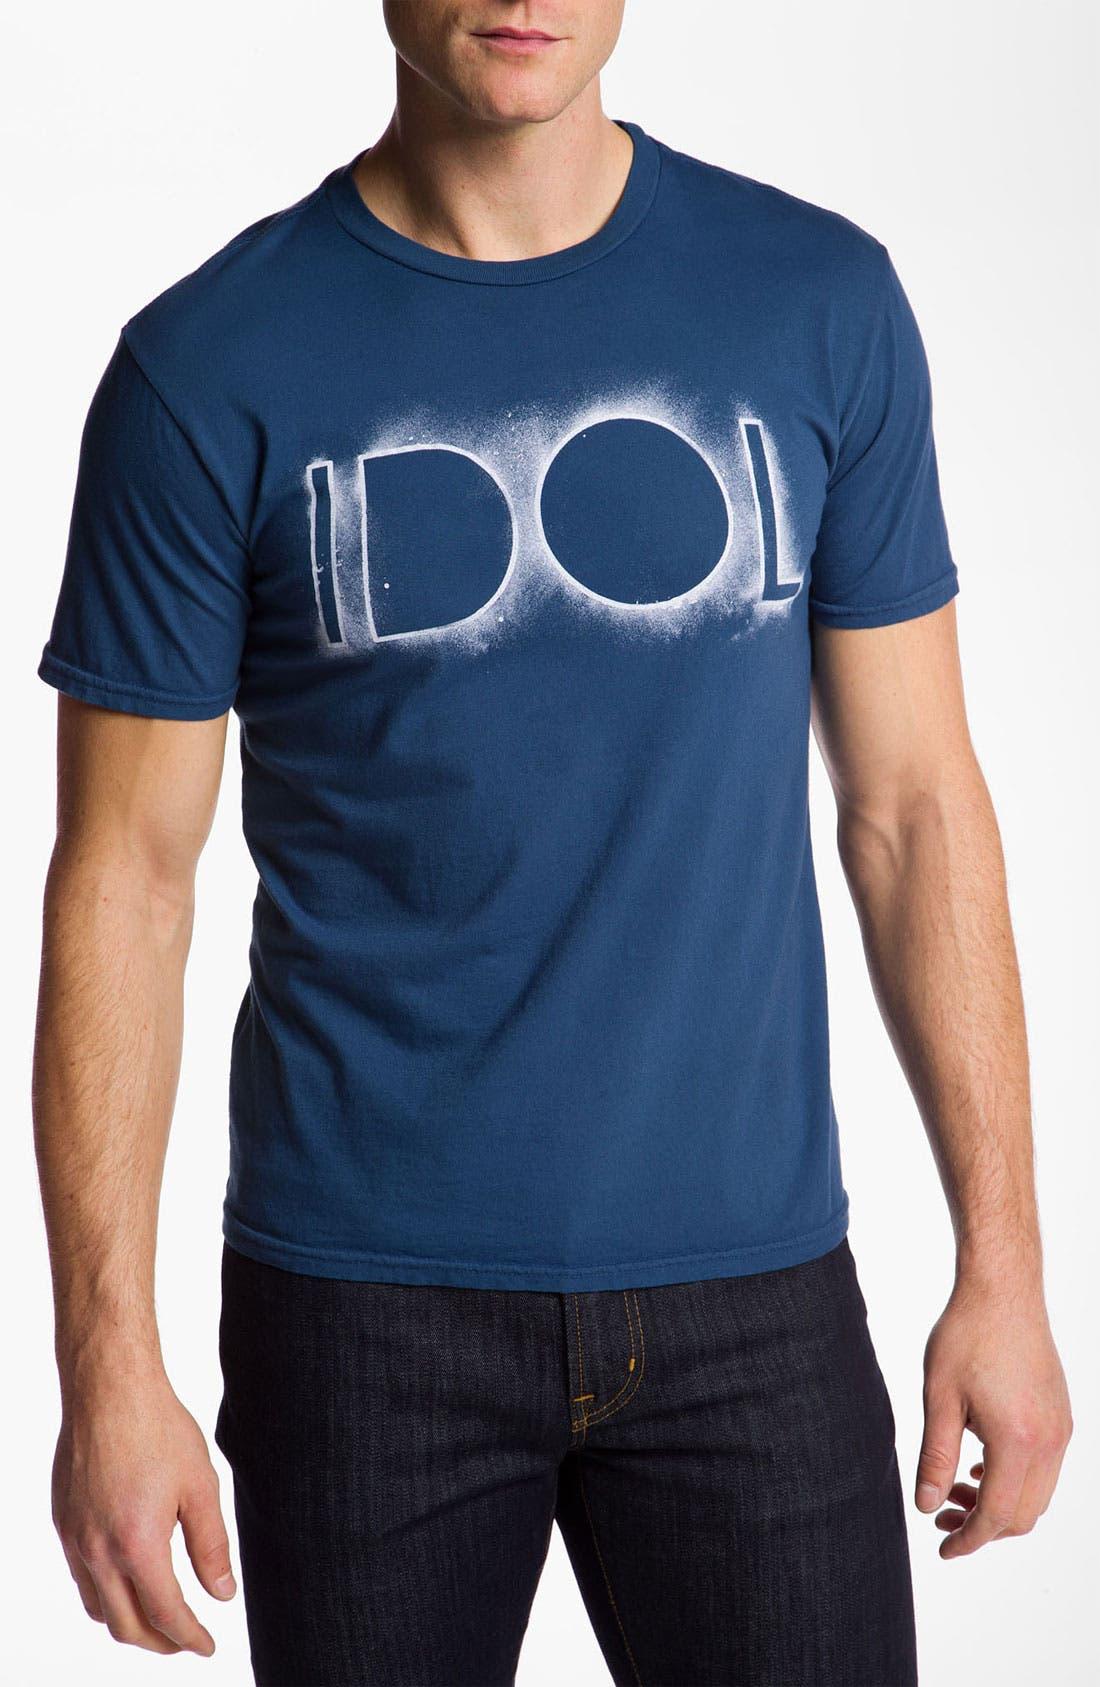 Alternate Image 1 Selected - Chaser 'Idol' T-Shirt